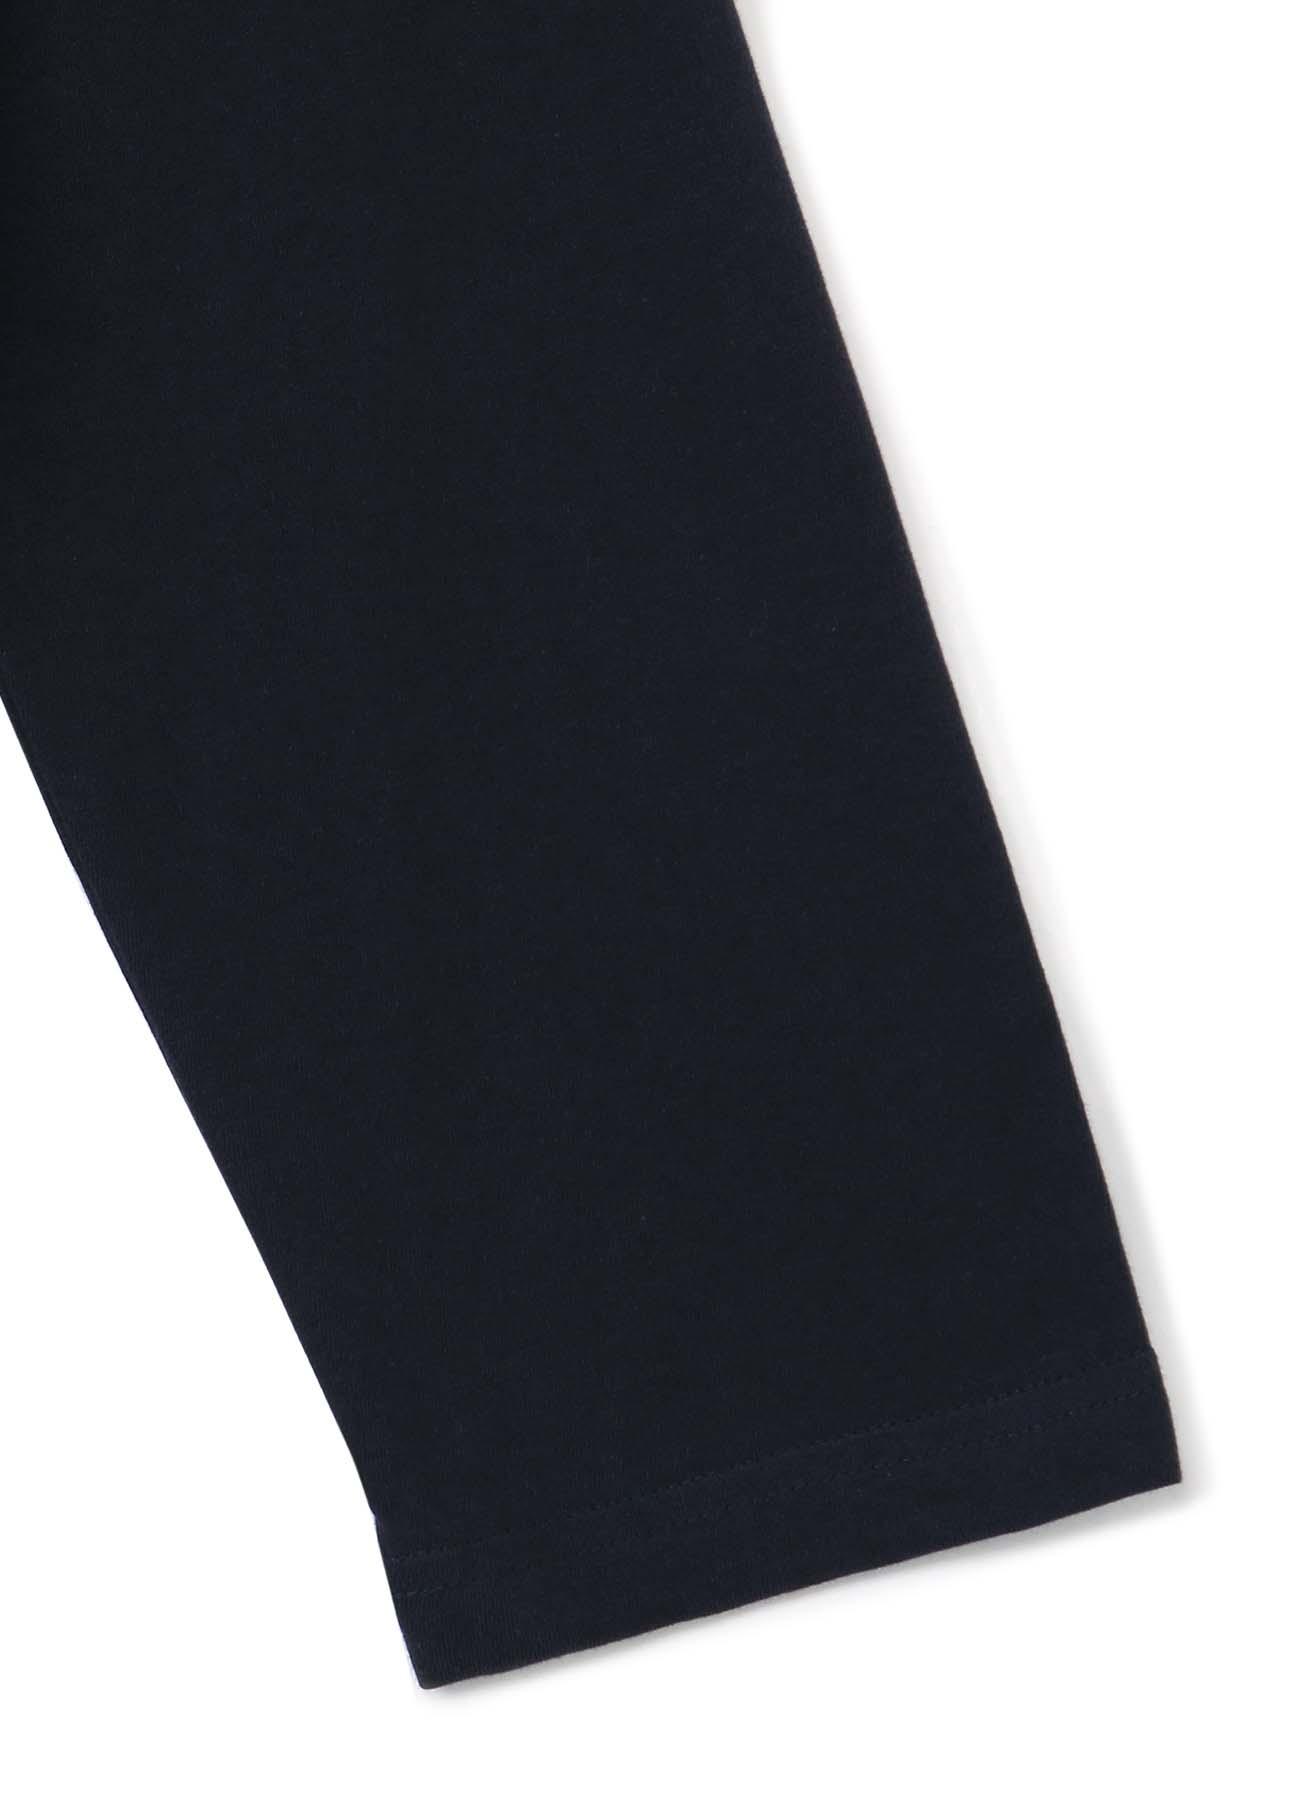 30/Cotton Jersey Asymmetric Zipper Long Sleeves Cut Sew